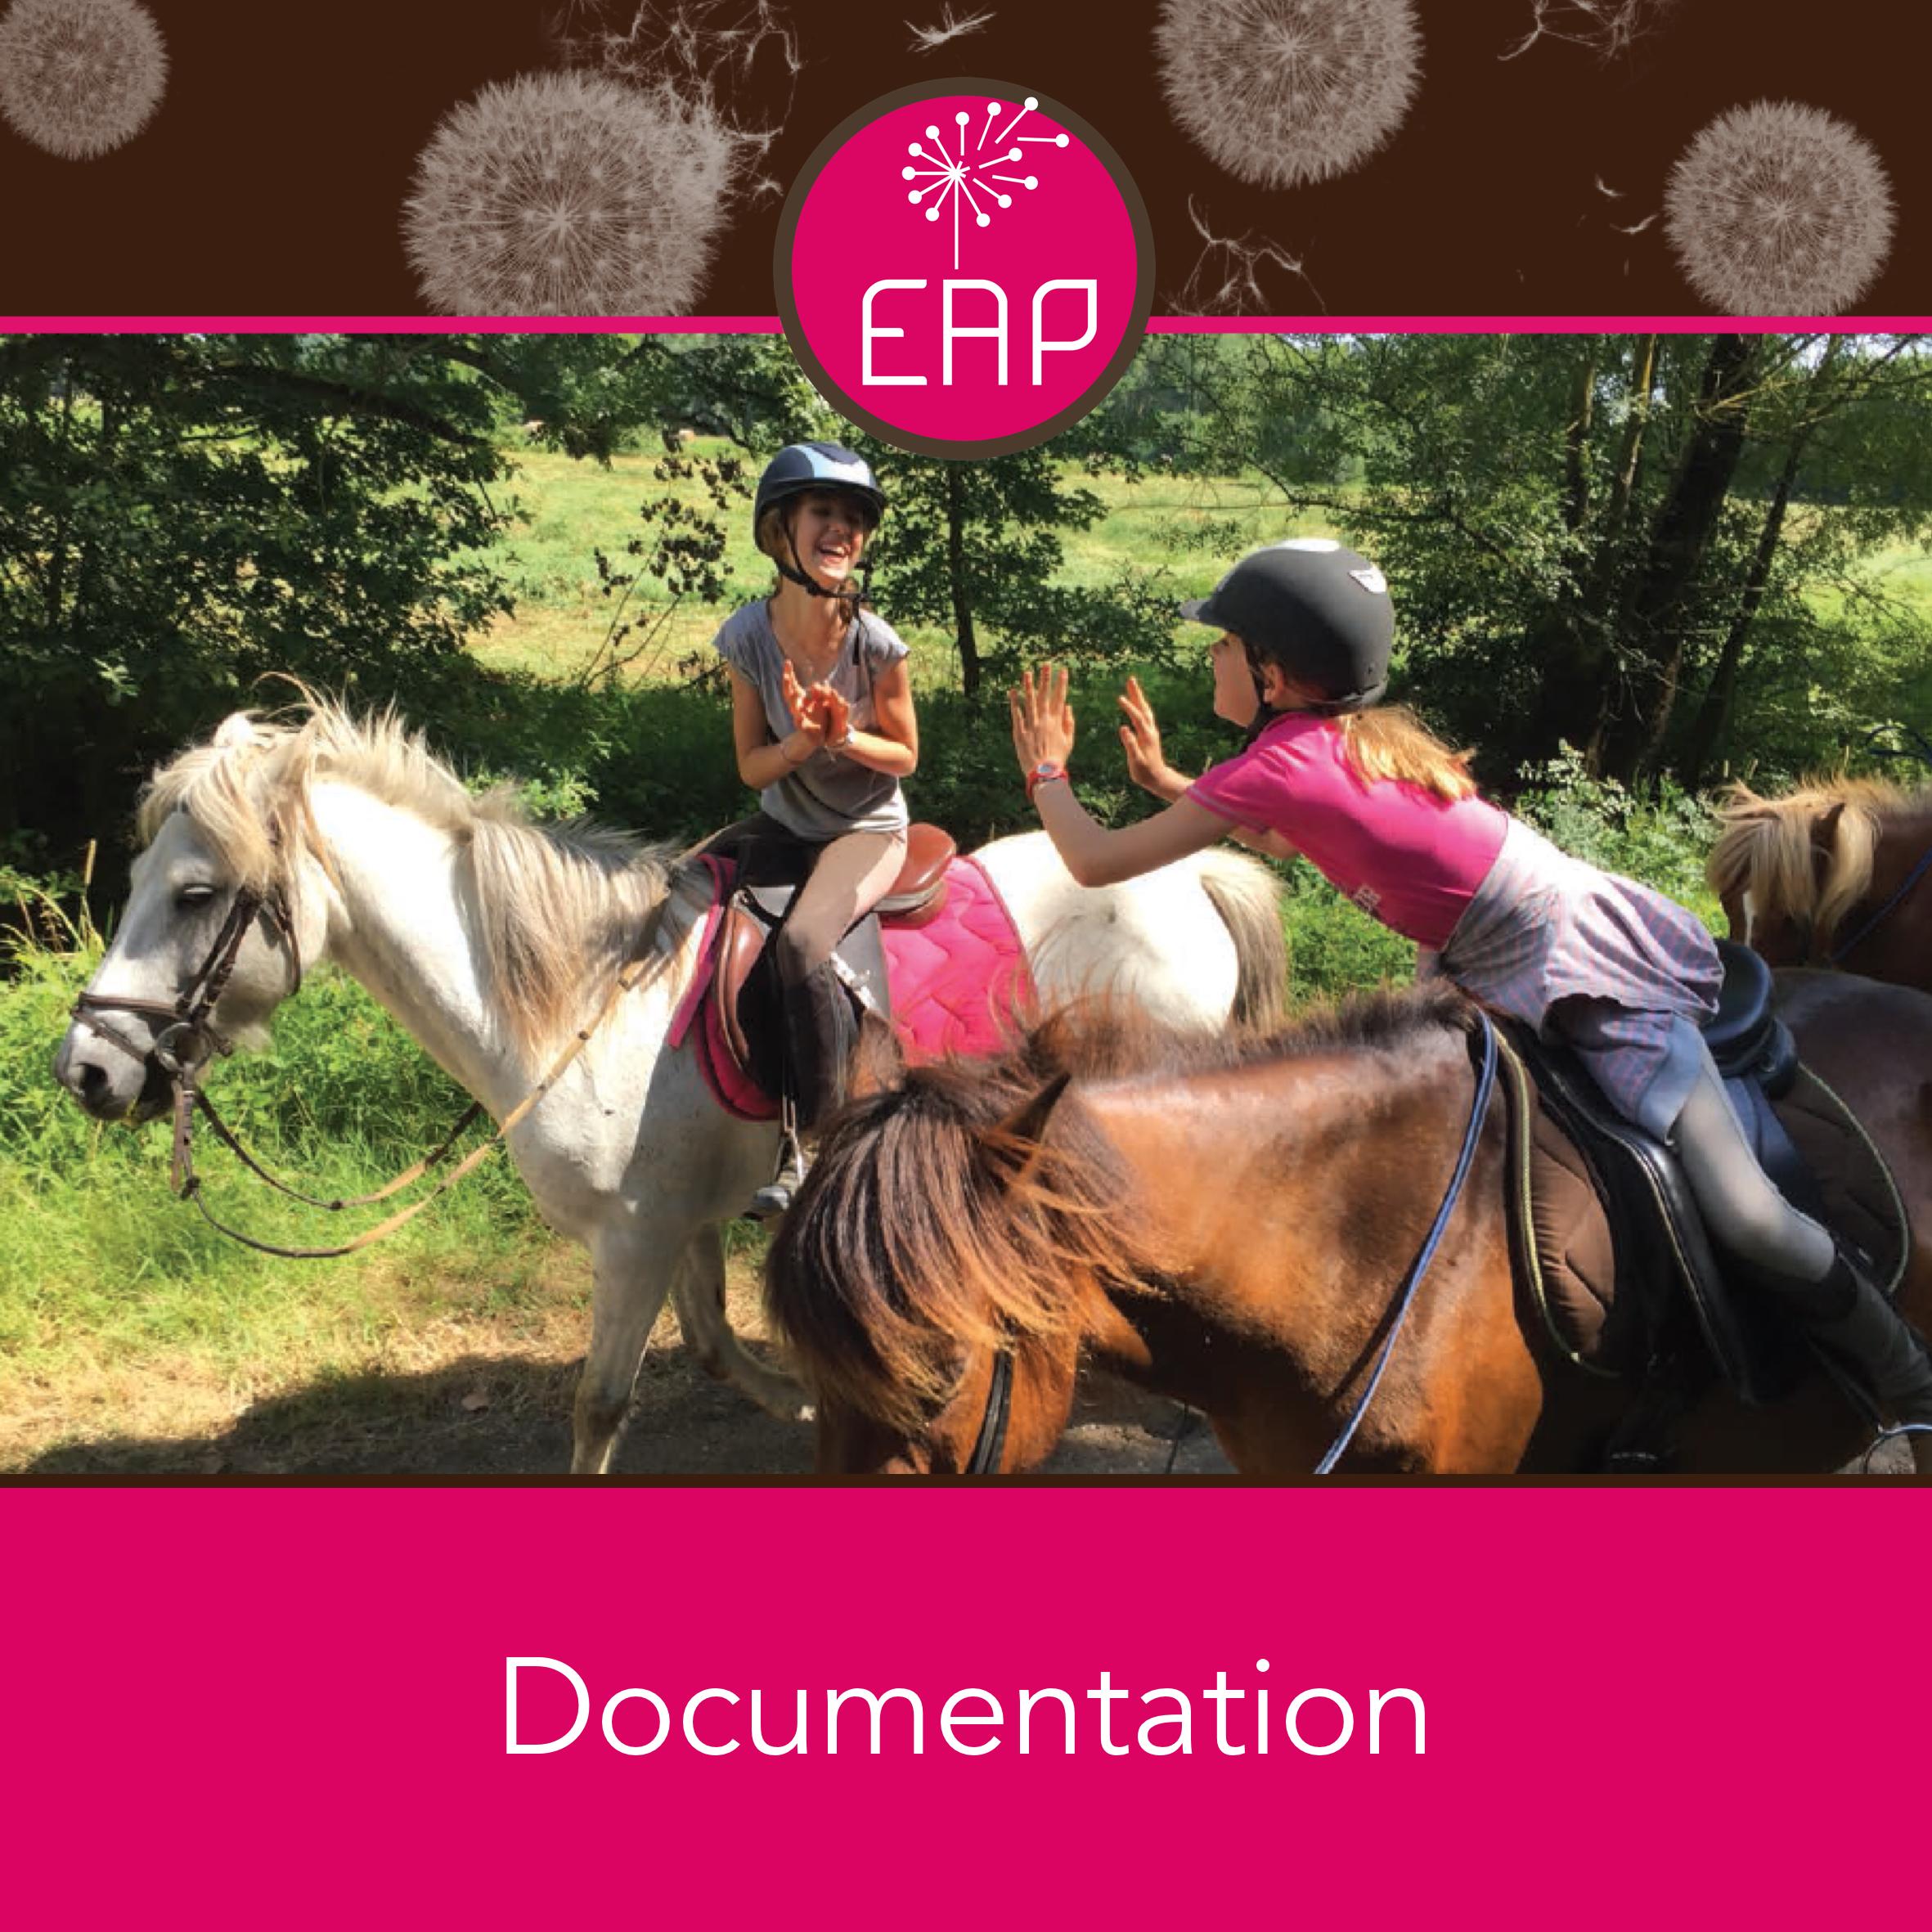 documentation-eap